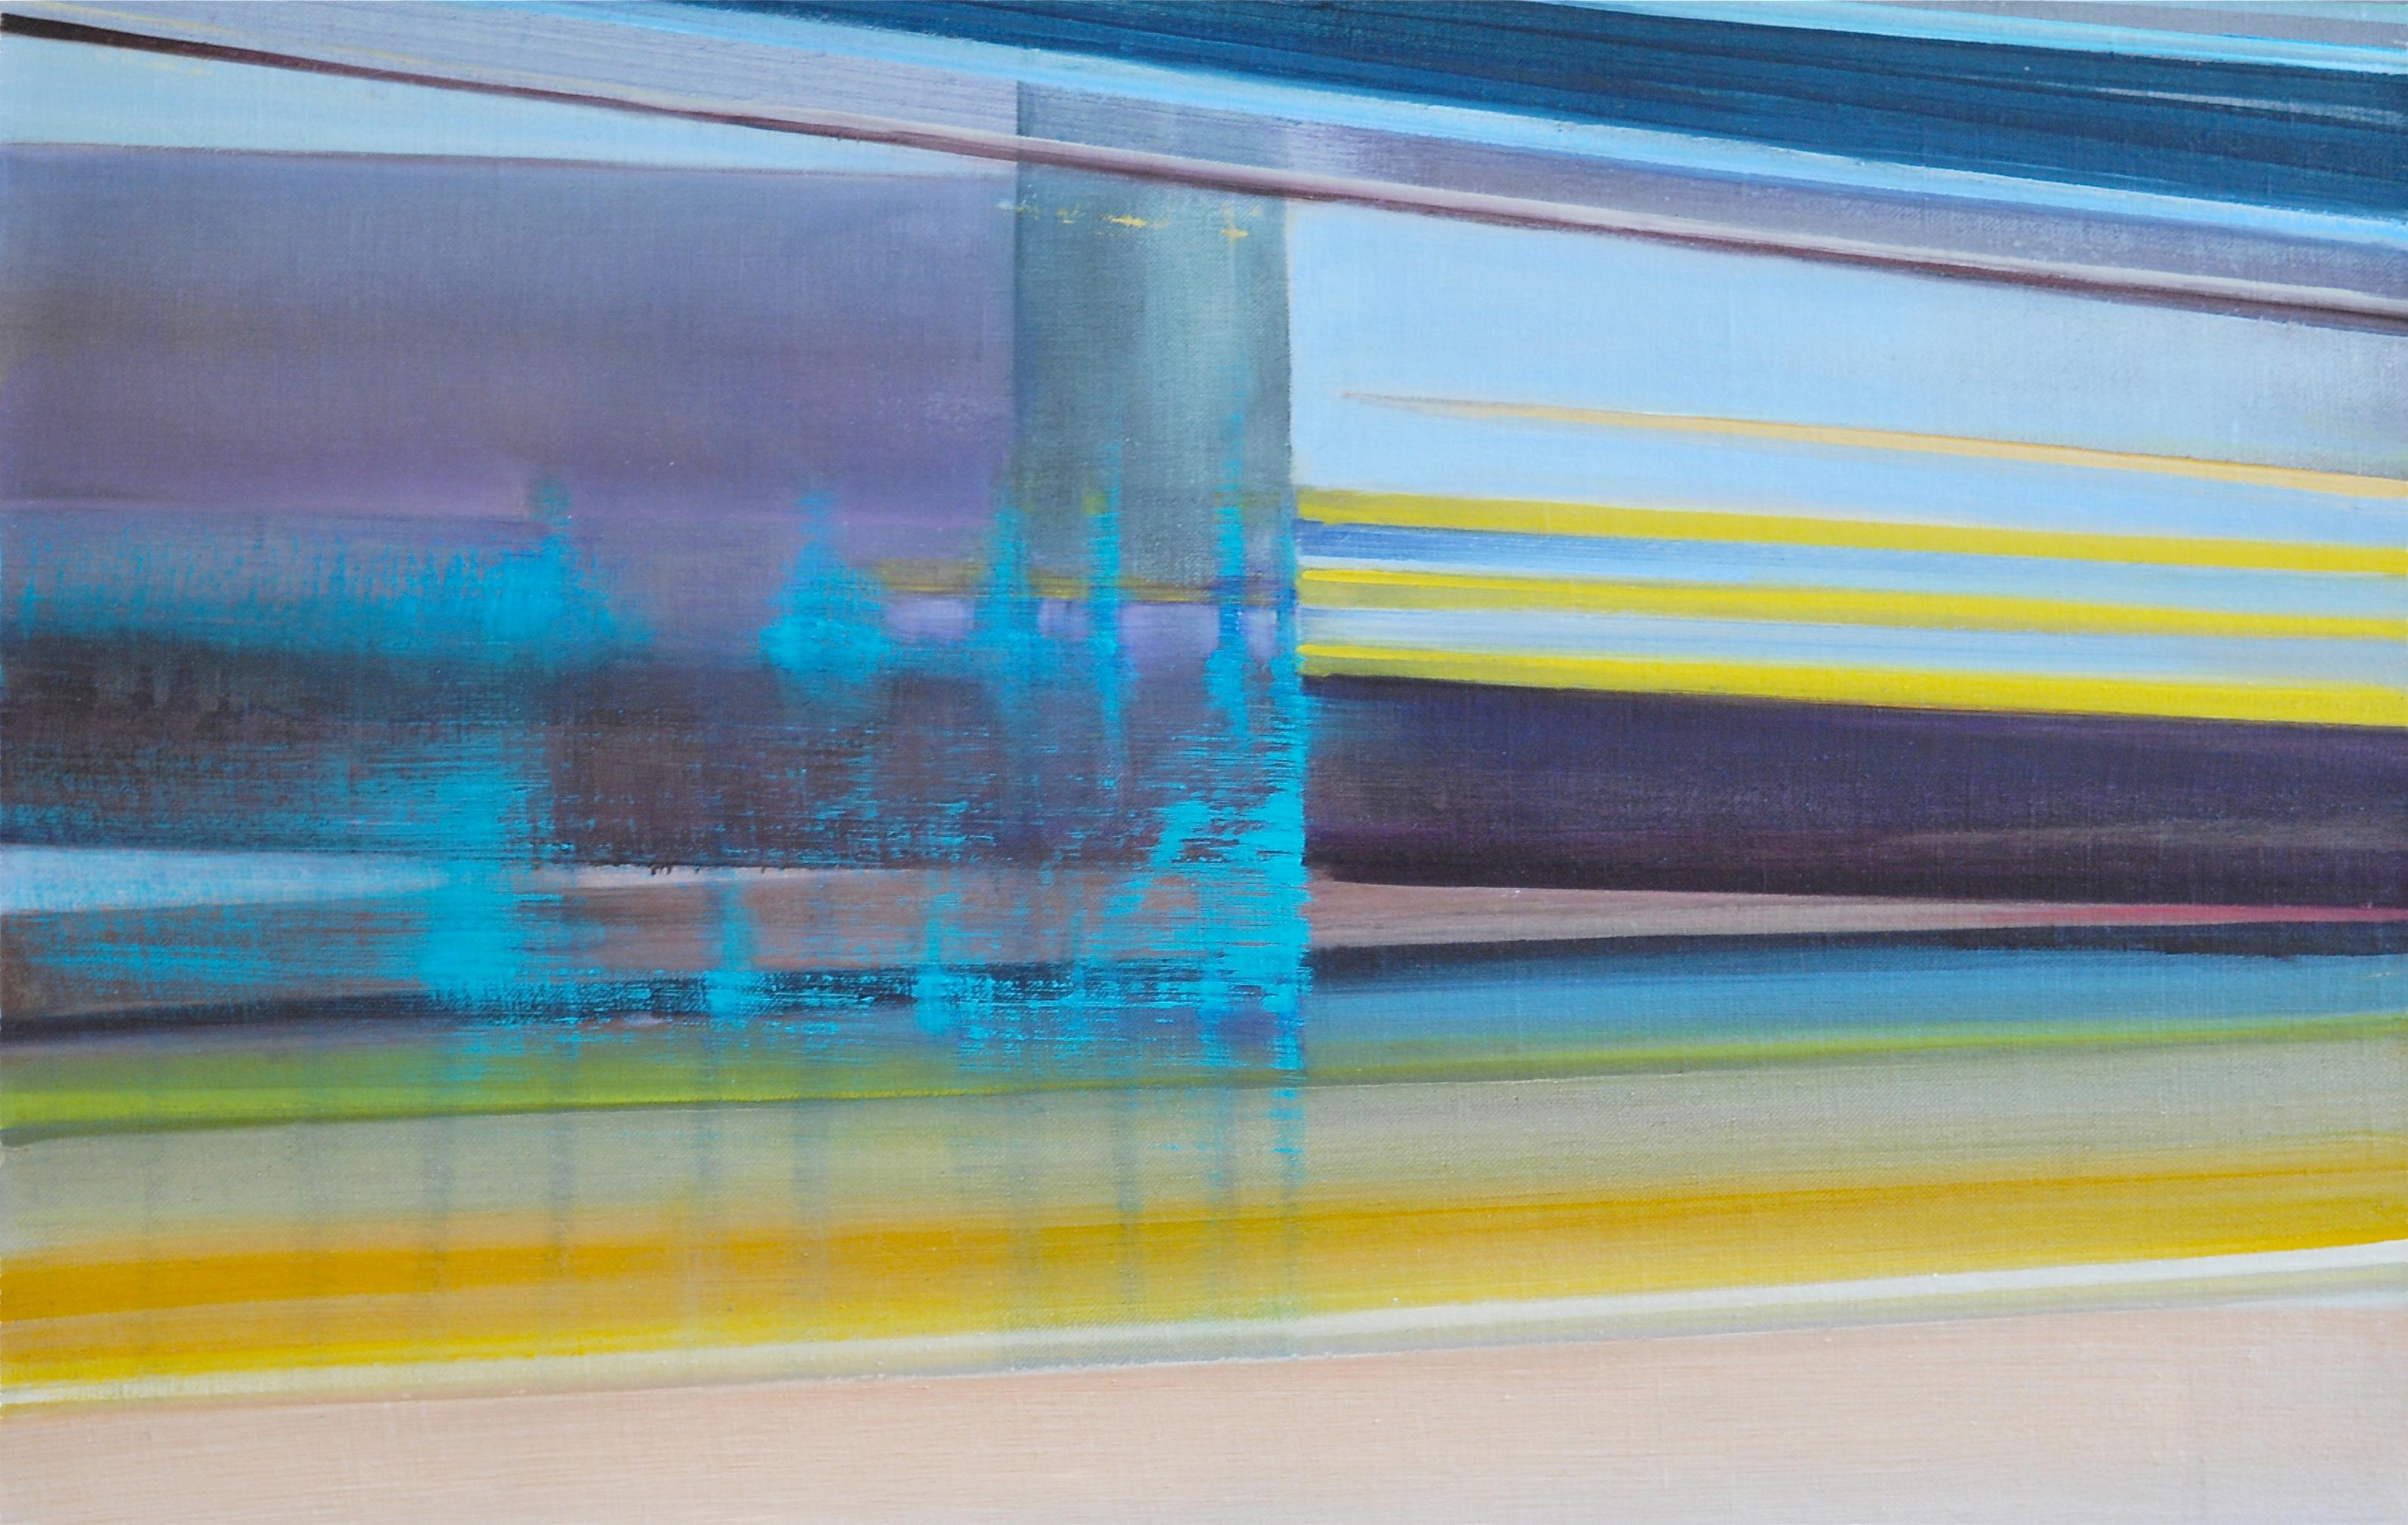 Riikka Ahlfors art painting taide maalaus untitled1, 69 cm x 44,5 cm, oil on canvas, 2012